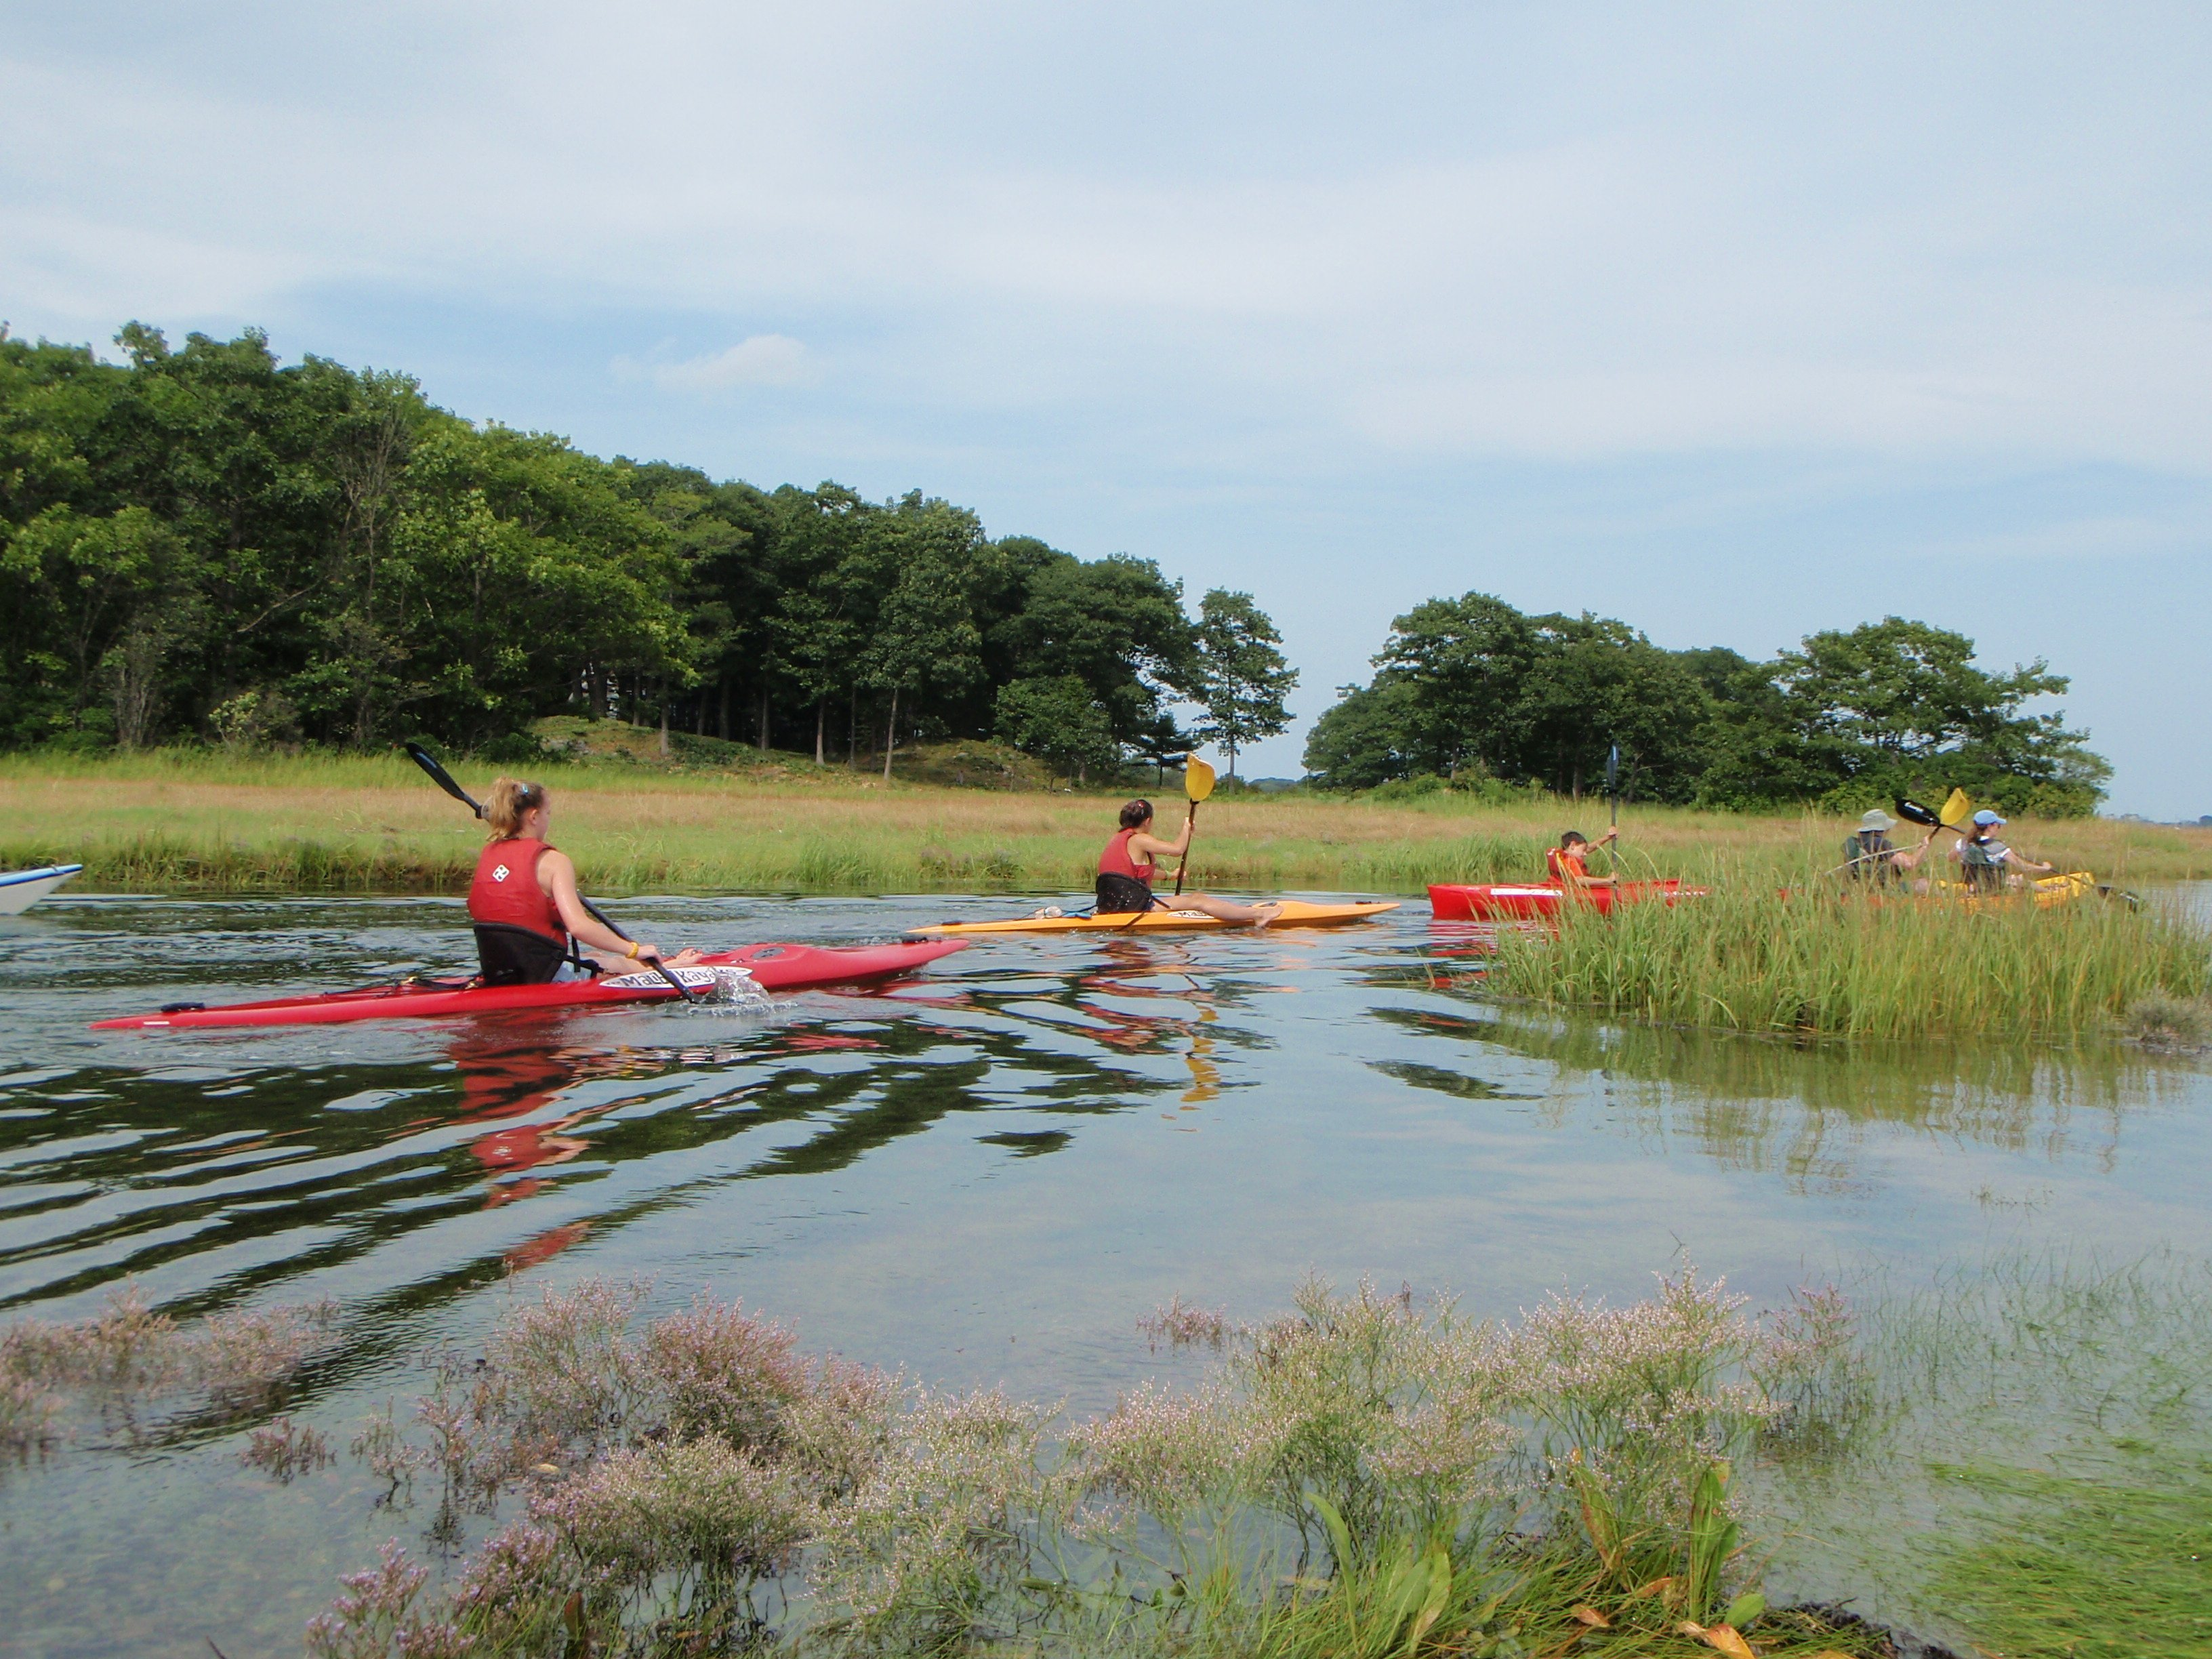 Meandering through the marsh.